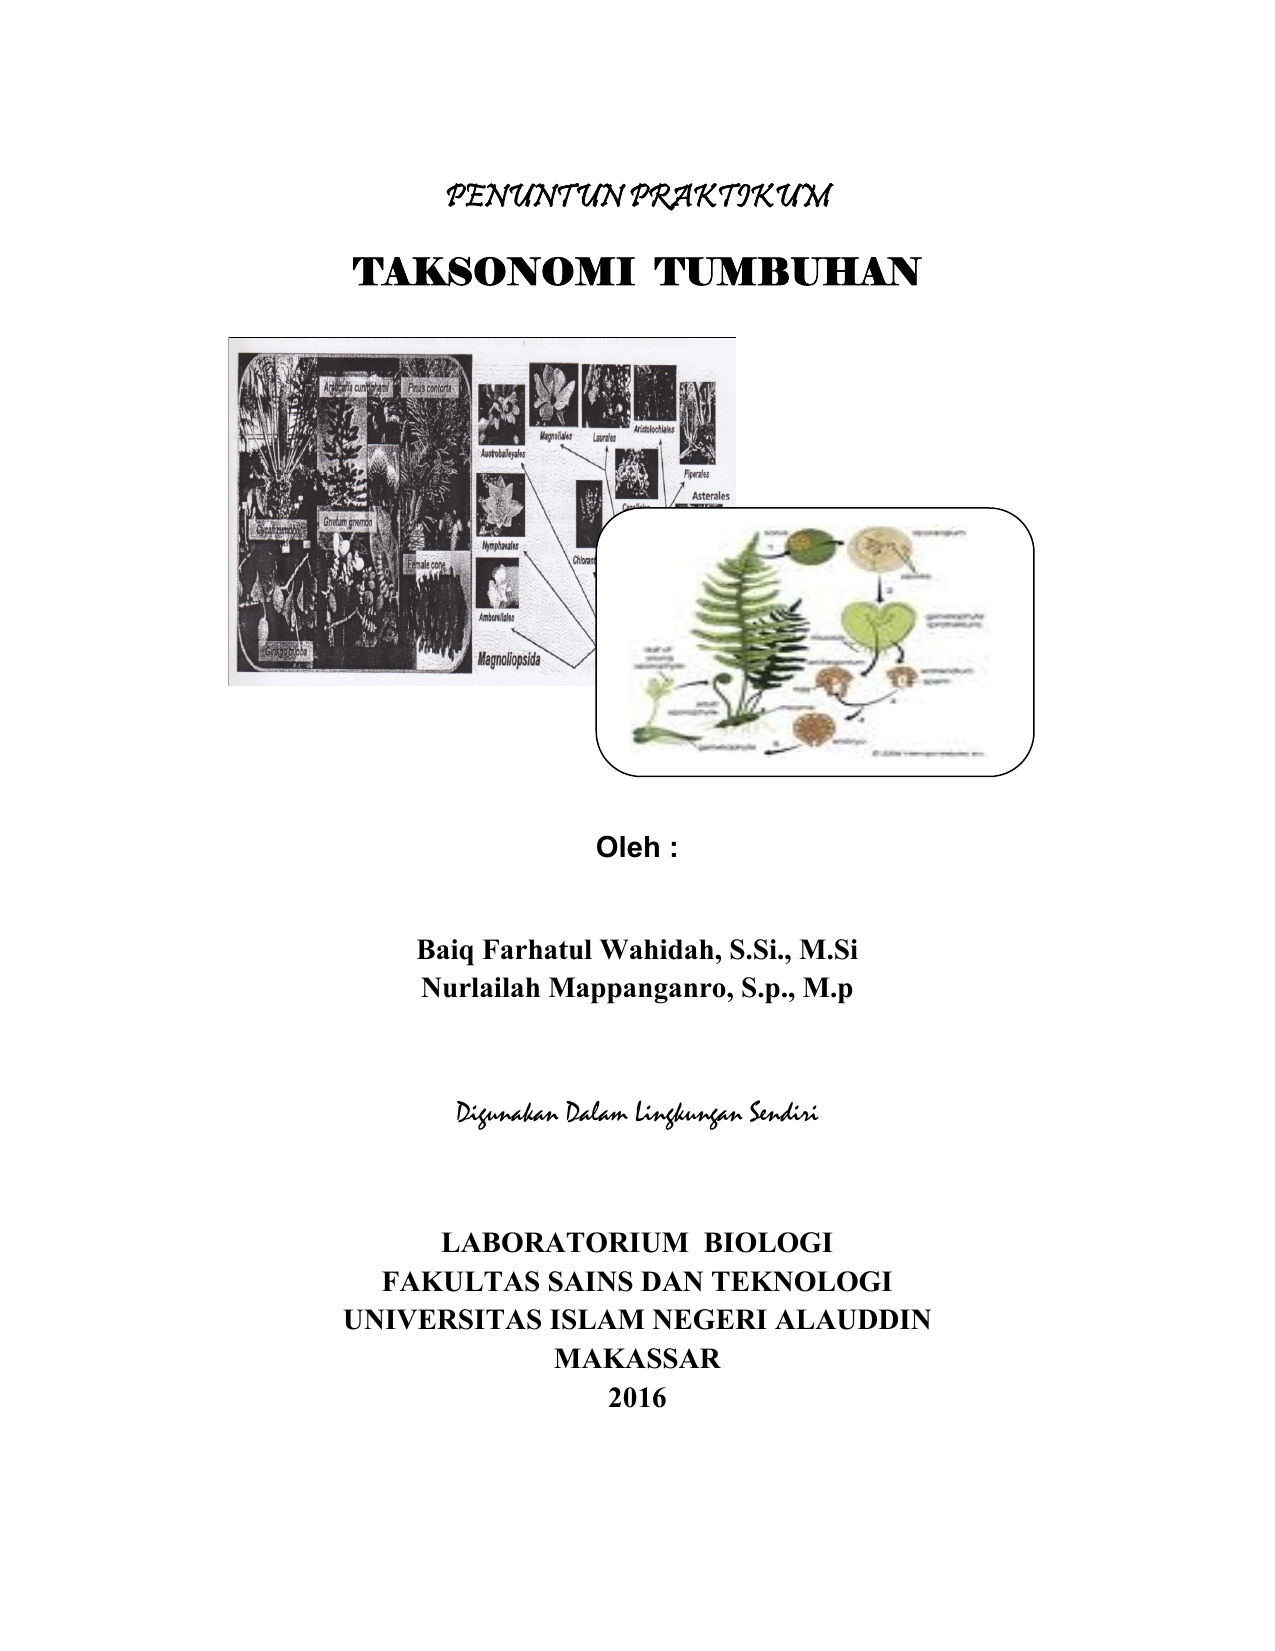 Taksonomi tumbuhan biologi uin alauddin makassar ccuart Images